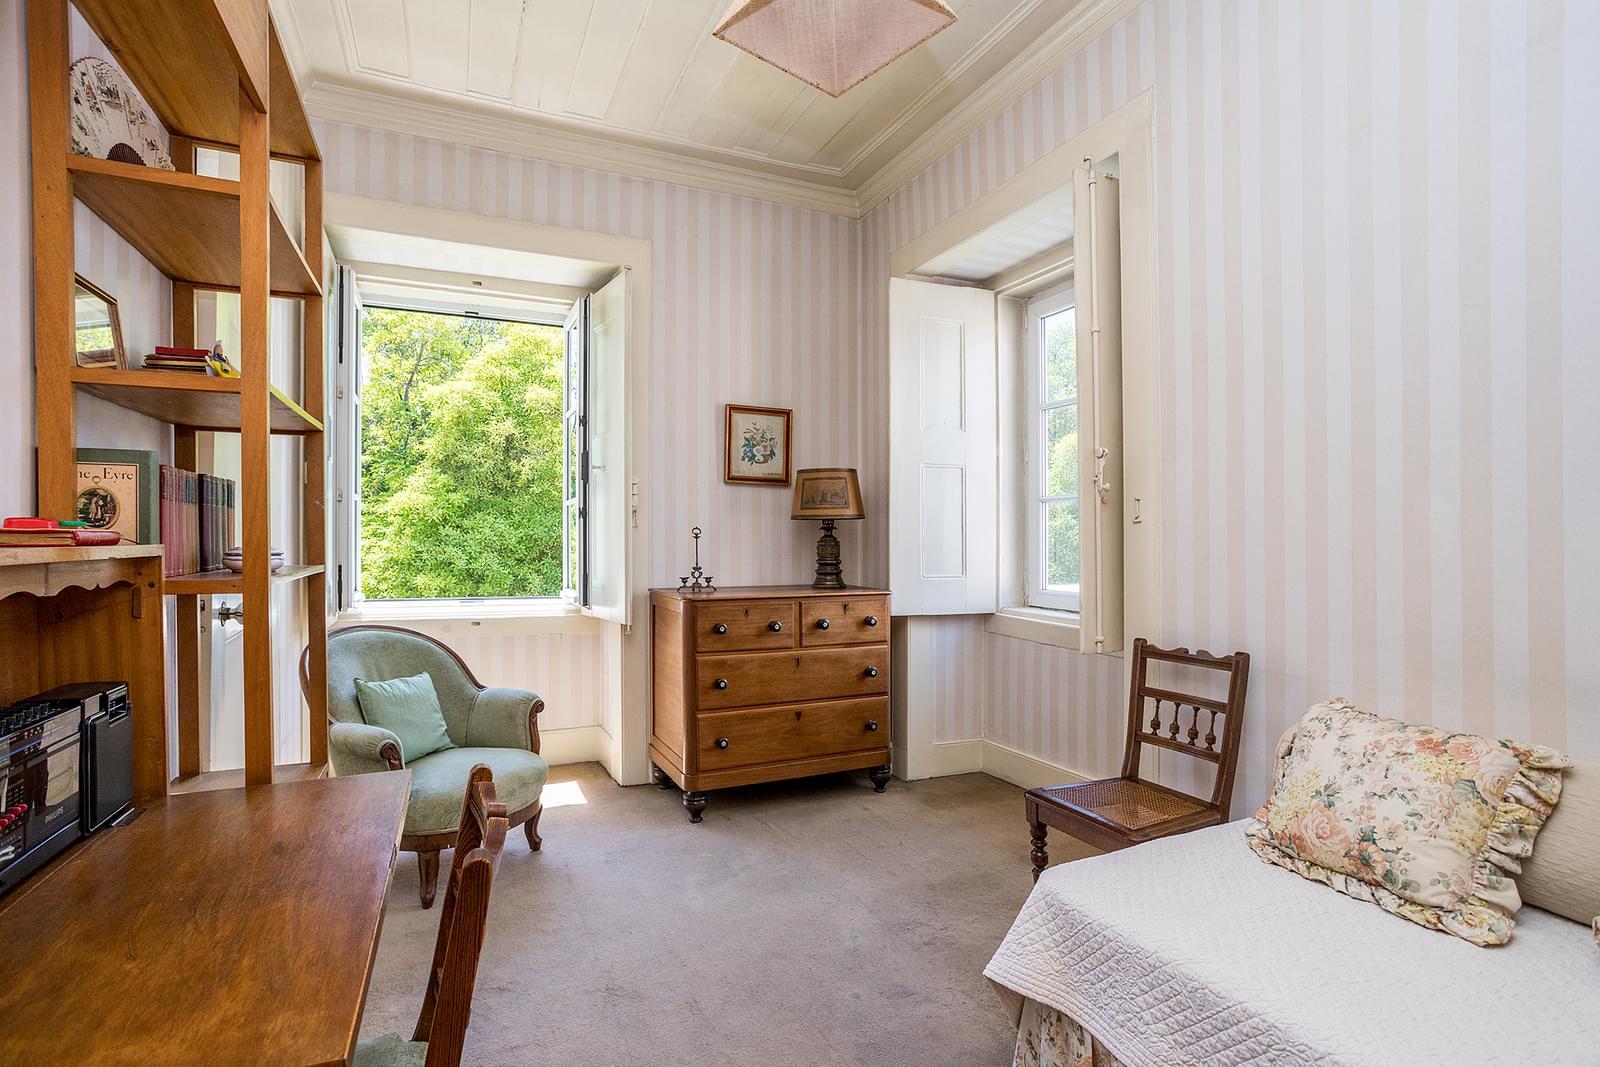 7 bedroom villa with parking